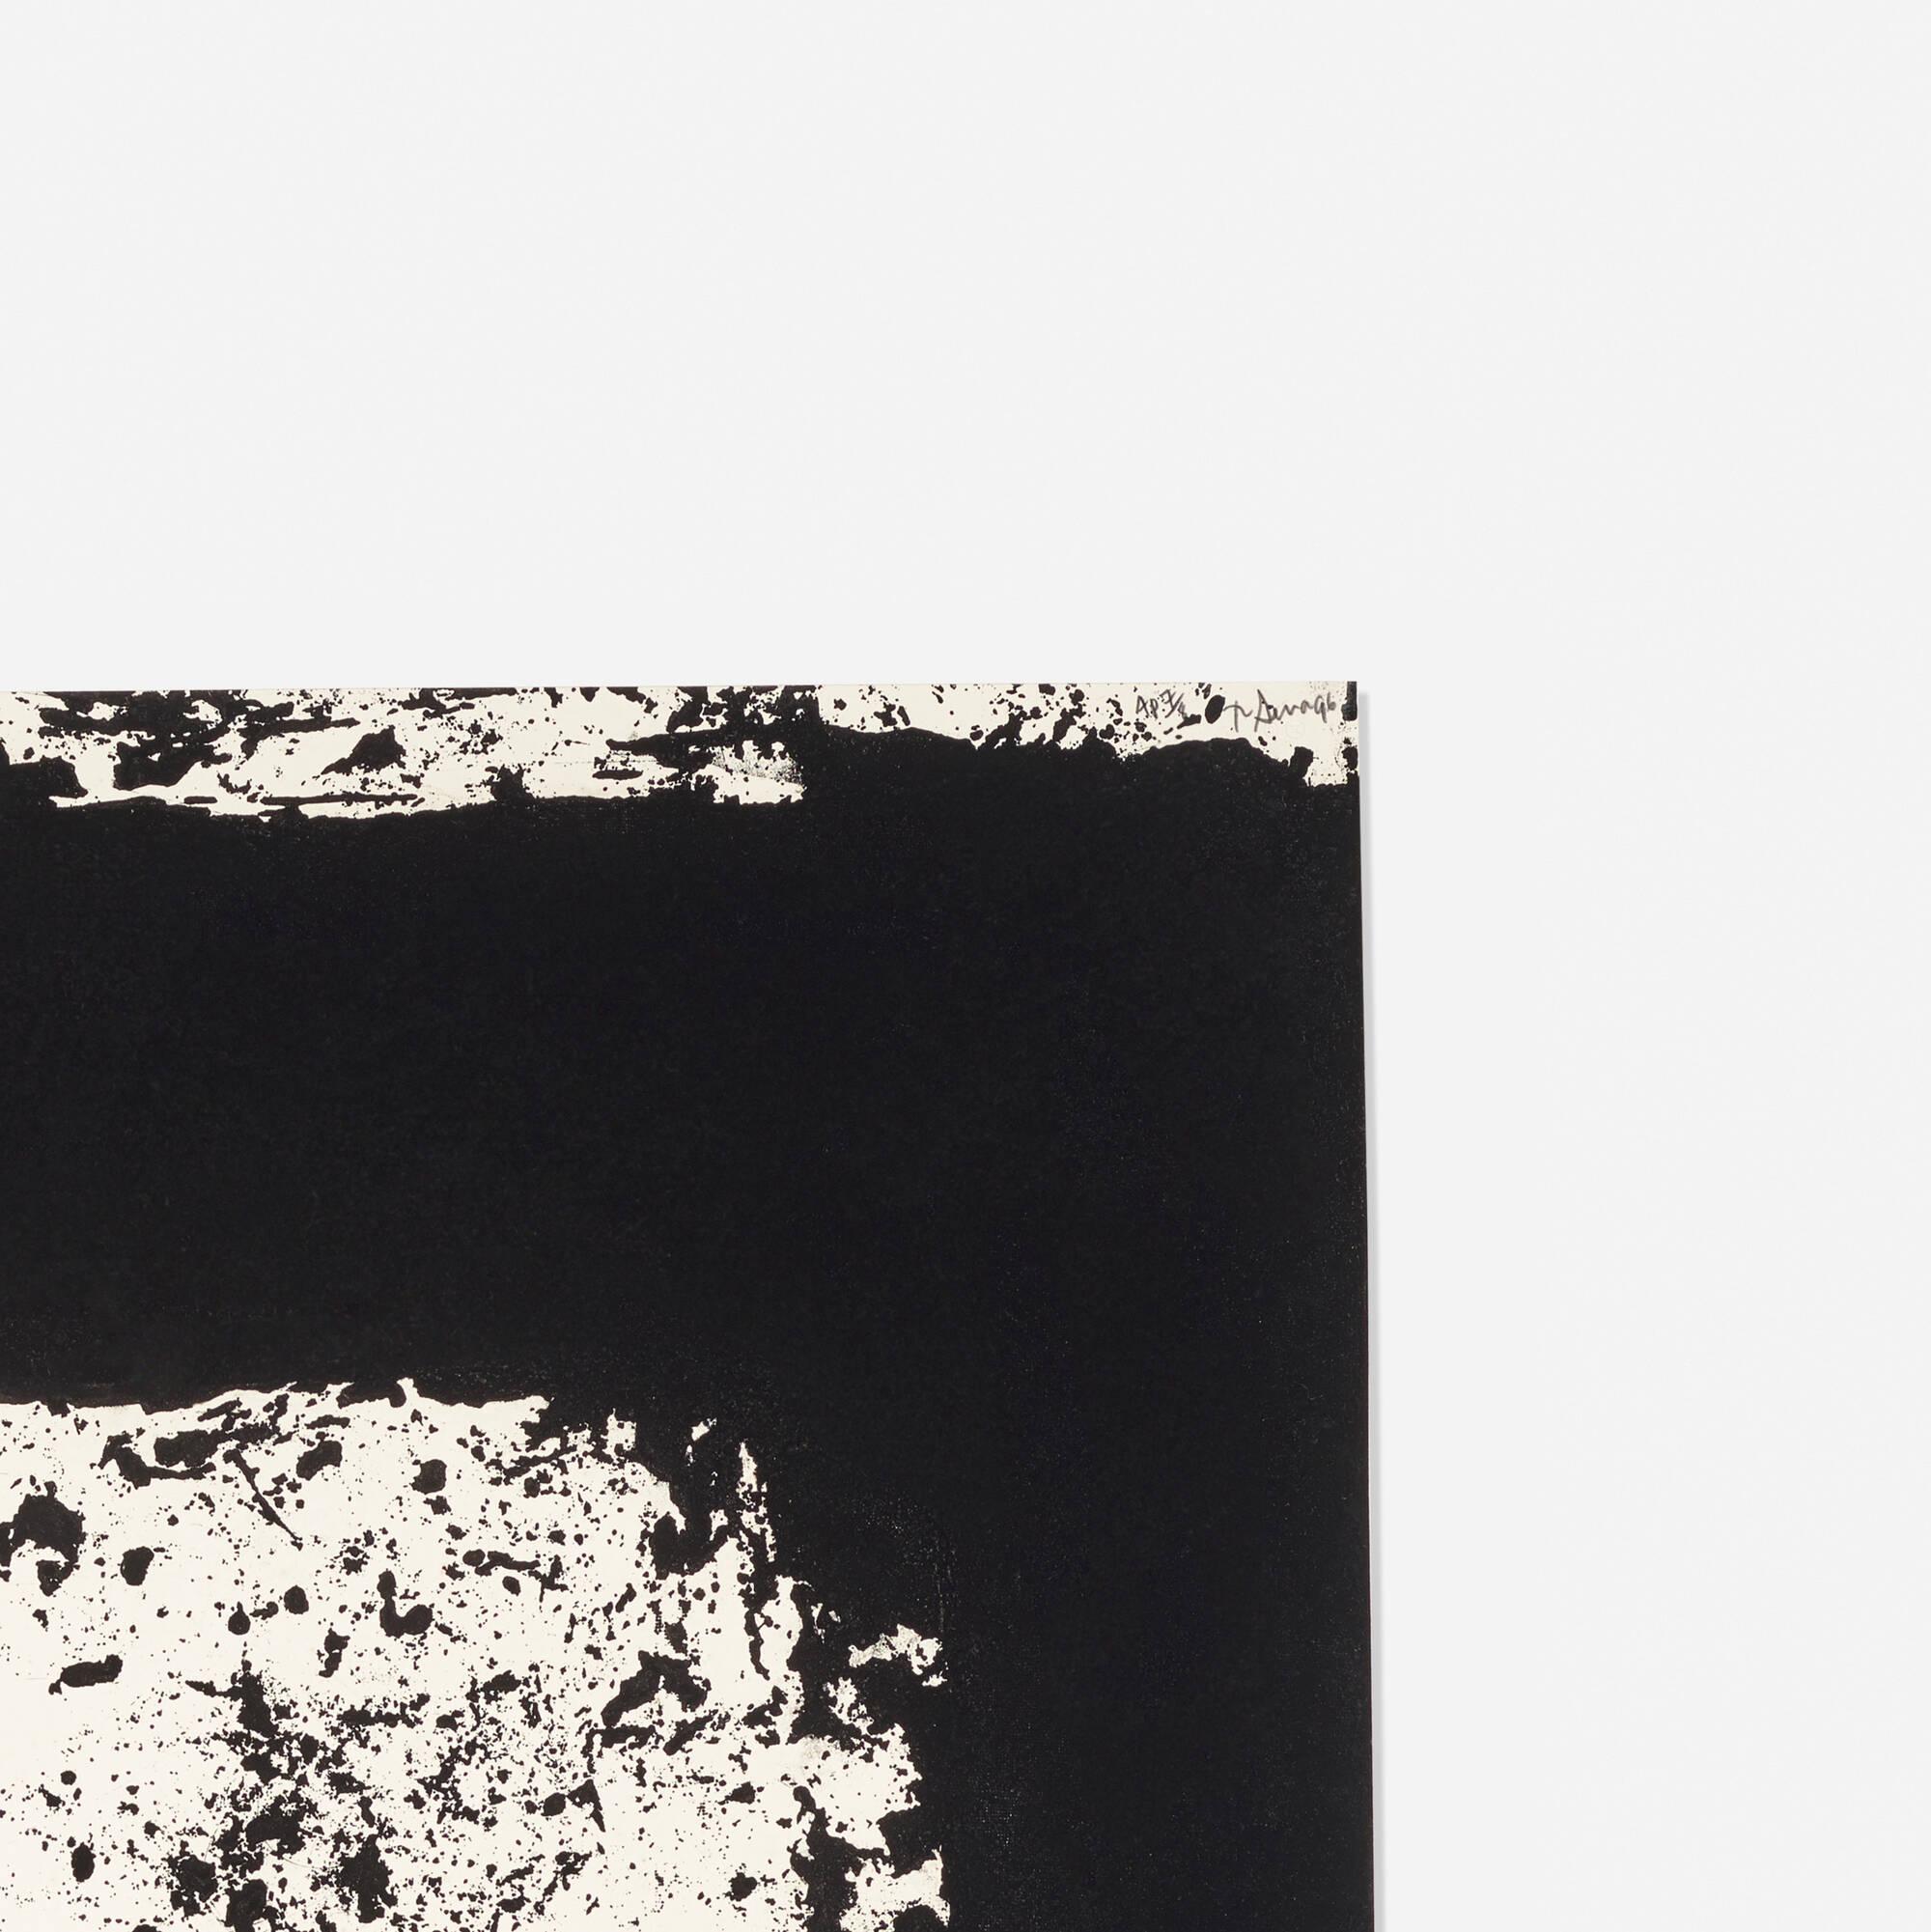 136: Richard Serra / For Joni (2 of 2)